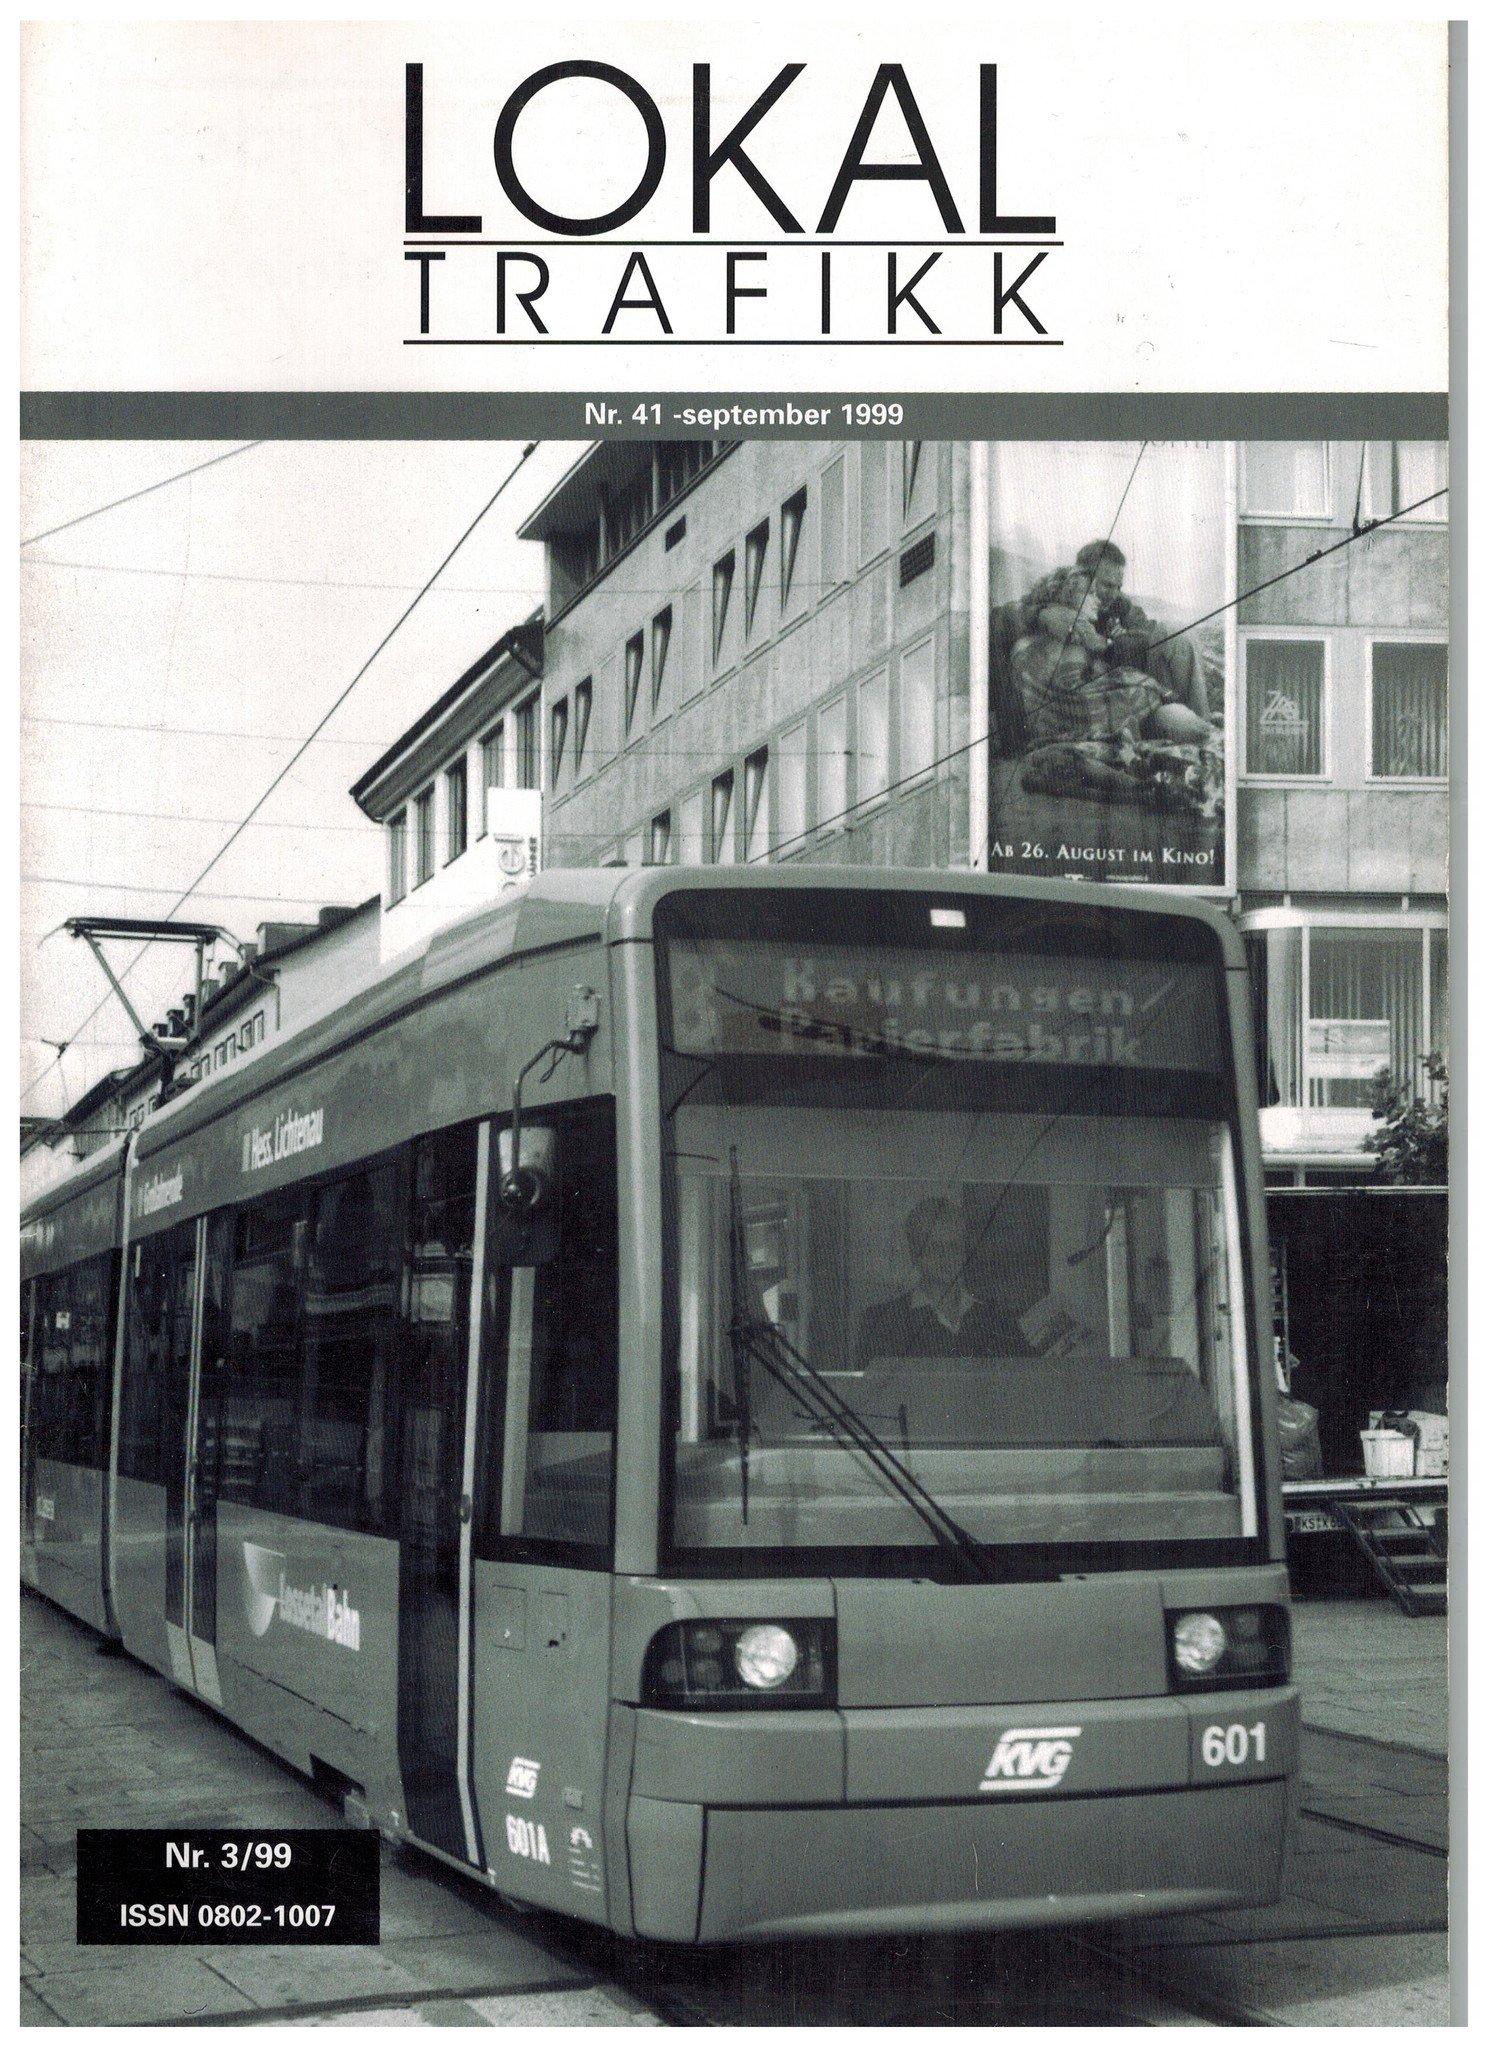 Lokaltrafikk #041